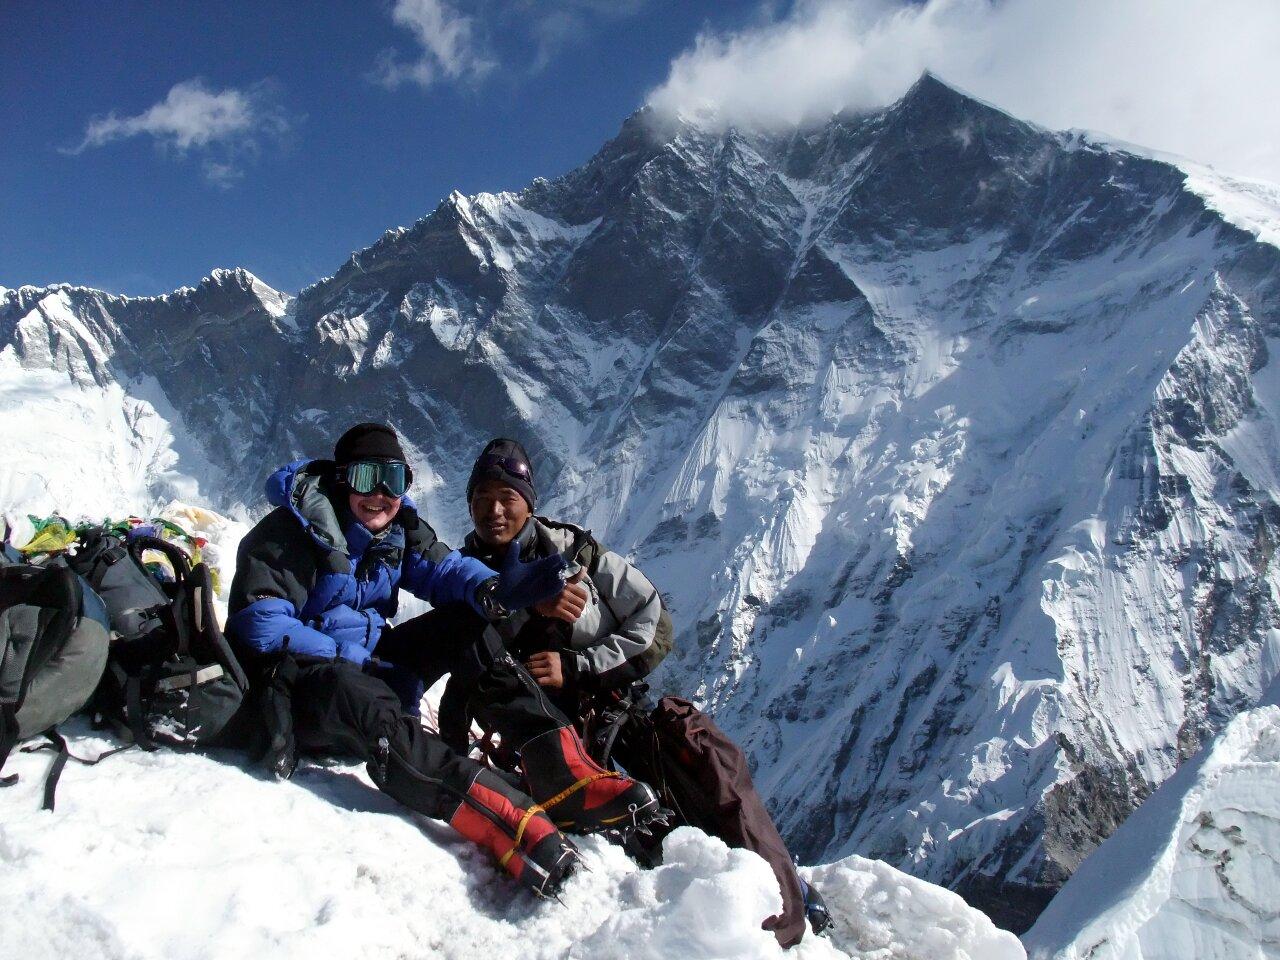 df7a1d79e3 South Peak  my attempt on Lhotse – Mark Horrell